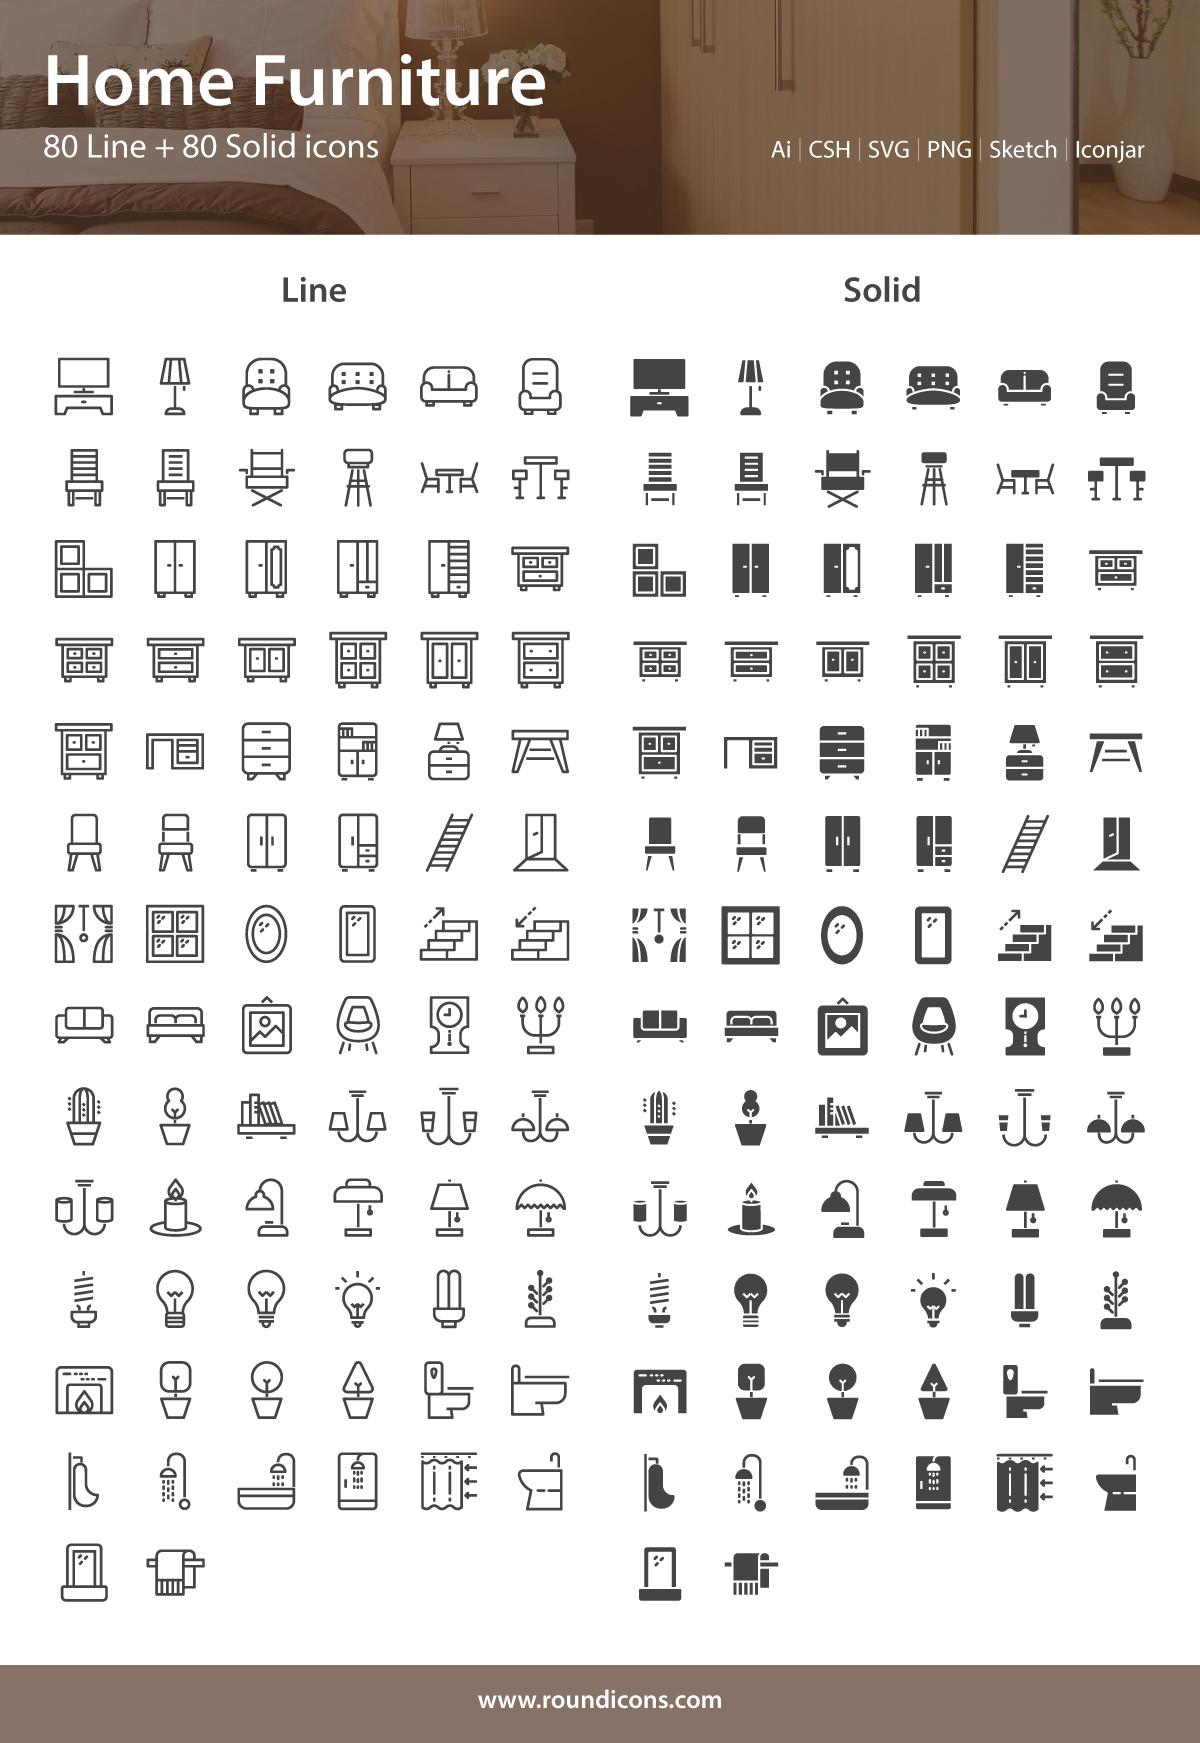 icon-sets